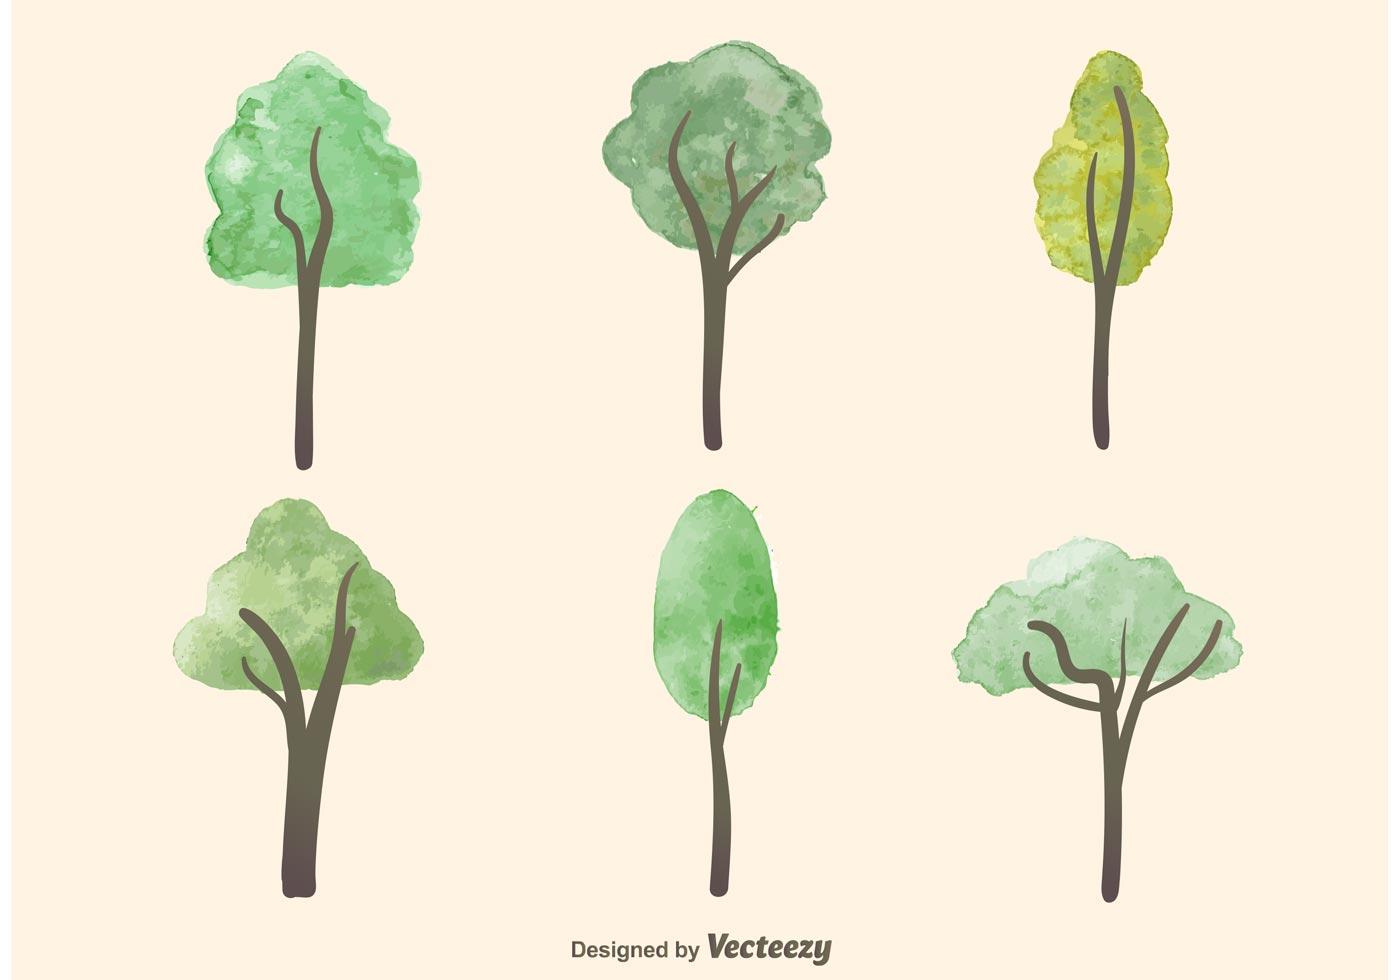 Paint Falling Wallpaper Watercolor Tree Vectors Download Free Vector Art Stock